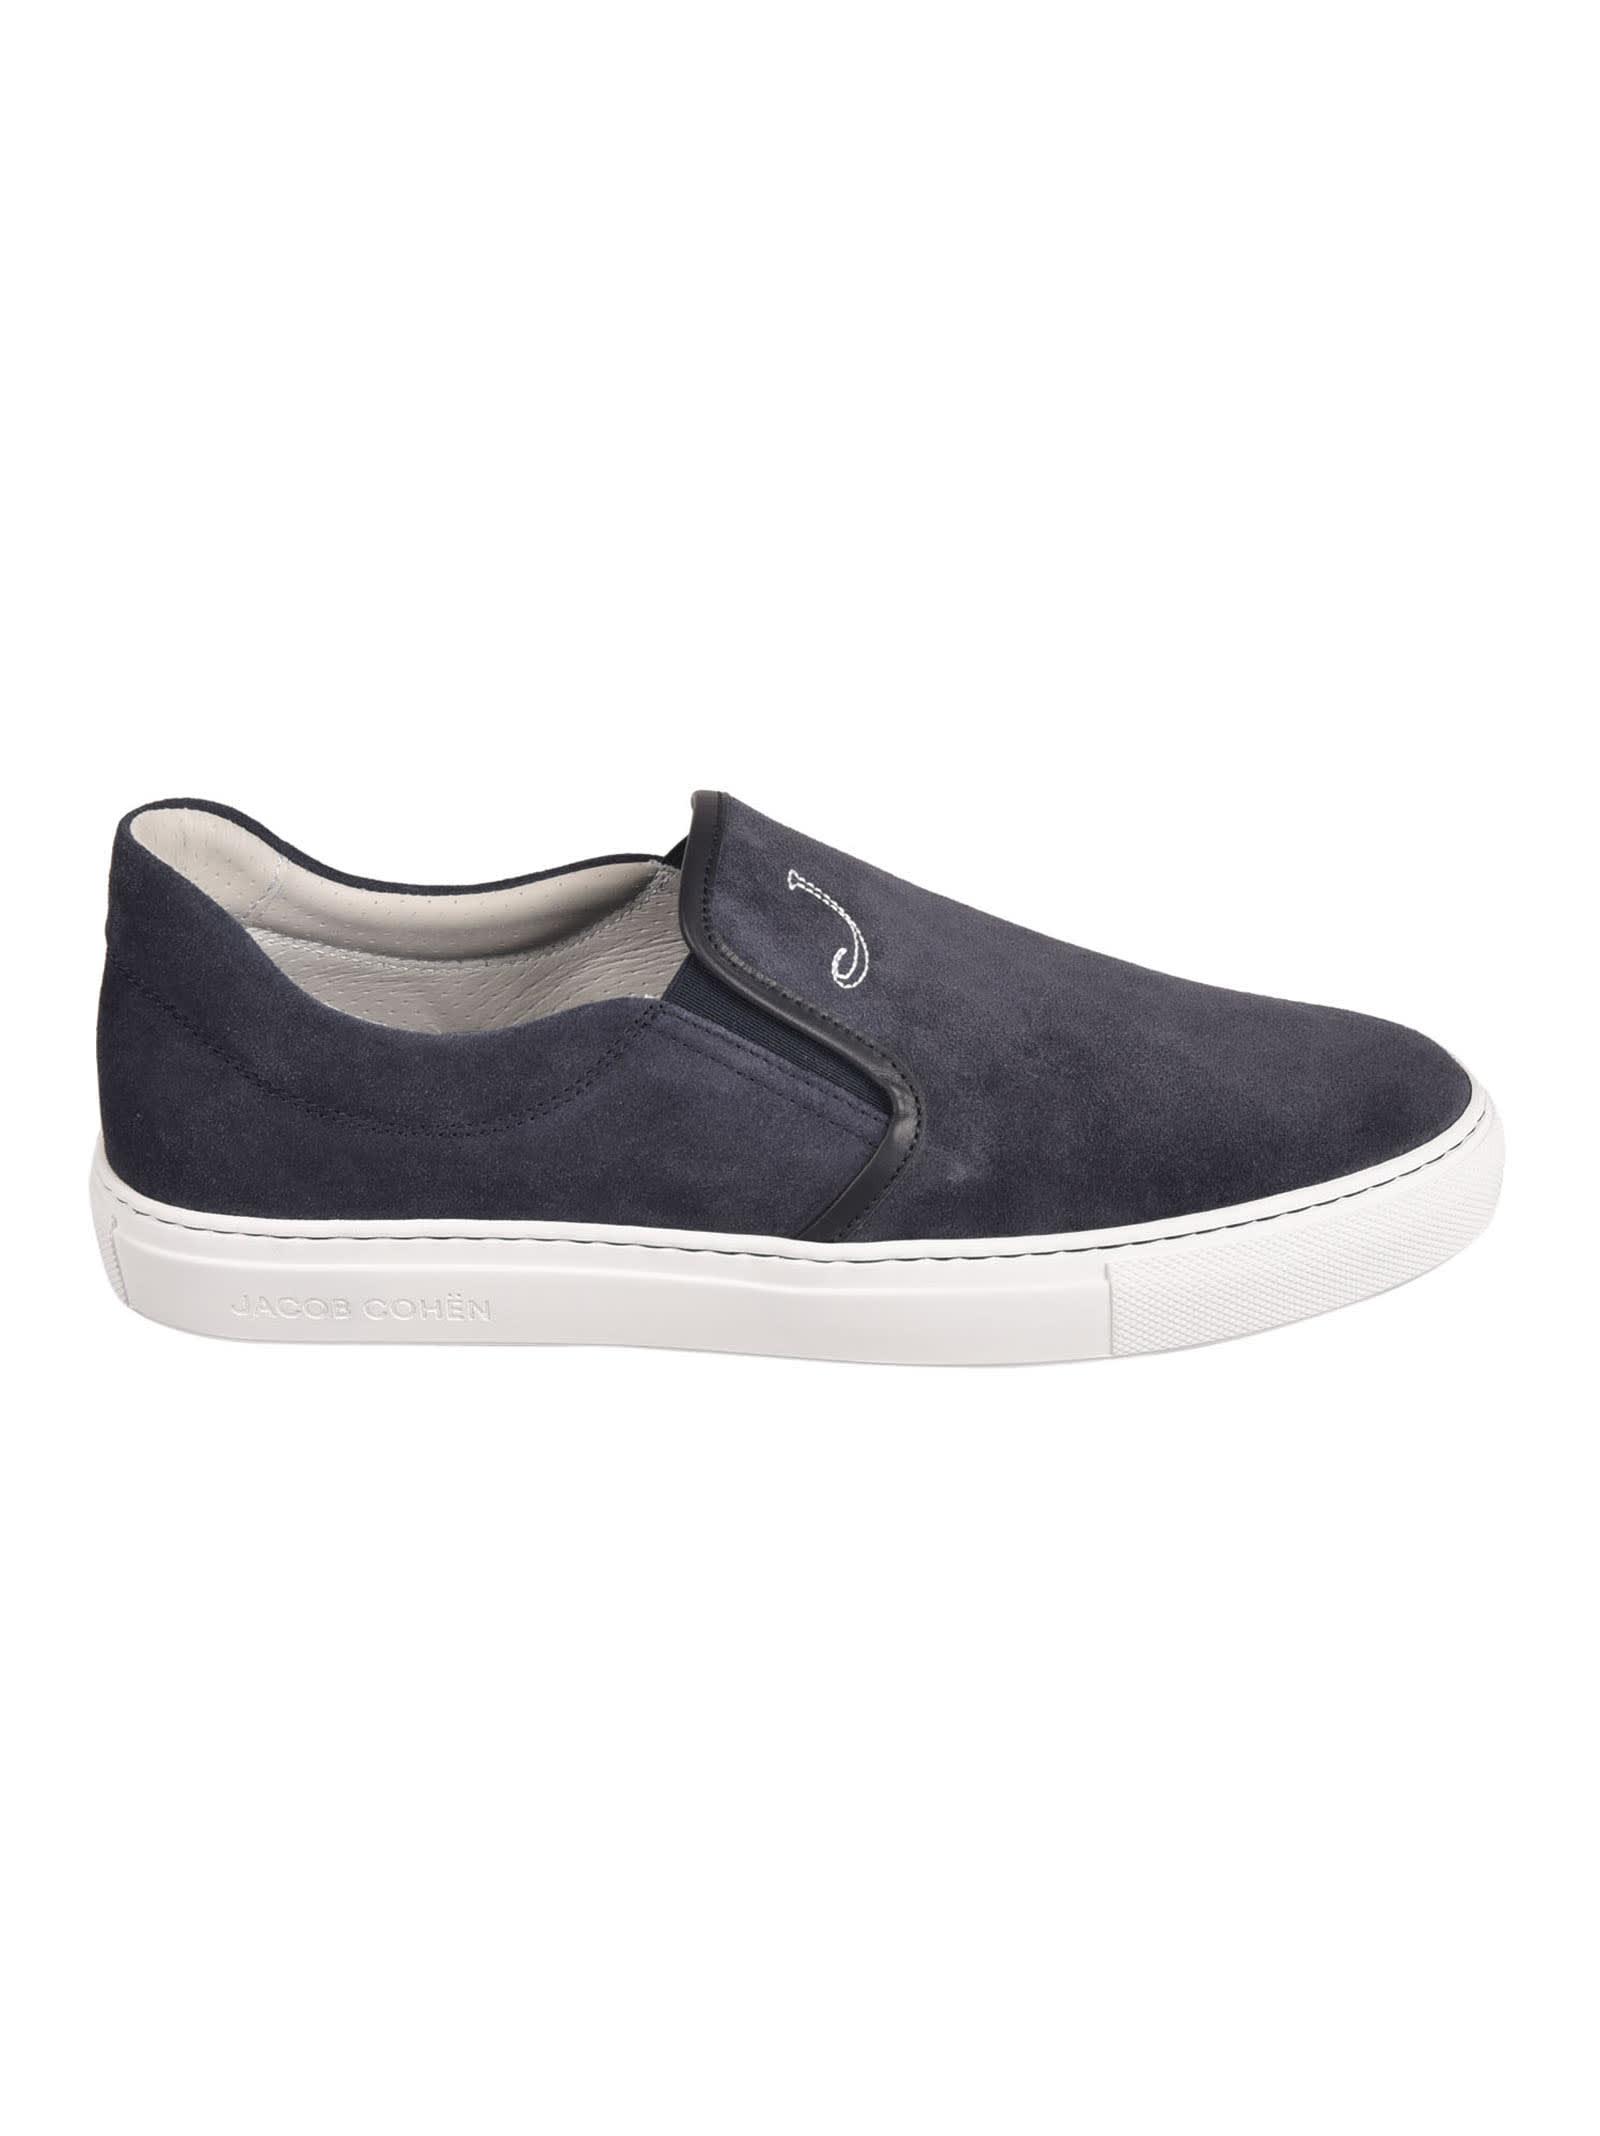 Jacob Cohen Sneakers SNEAKERS